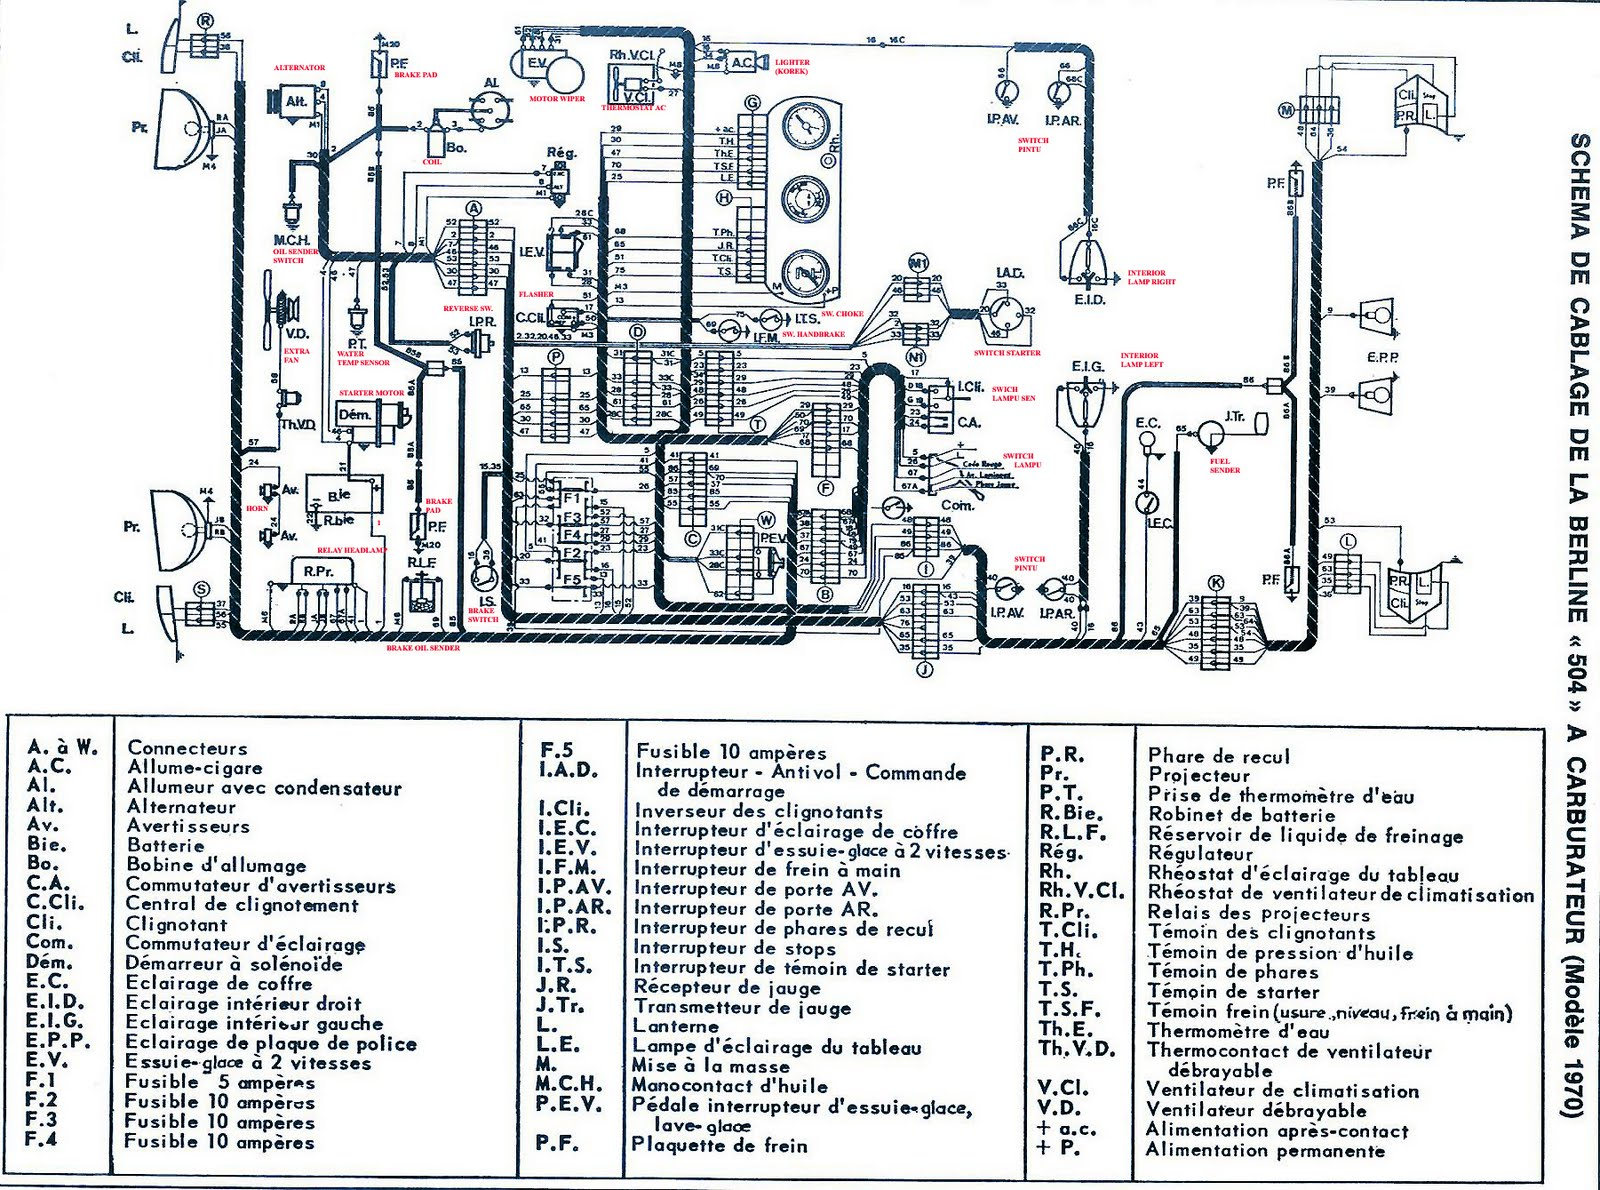 Wiring diagram kelistrikan toyota avanza love wiring diagram ideas diagram kelistrikan sederhana ac mobil manual book toyota avanza pdf google docs asfbconference2016 Choice Image